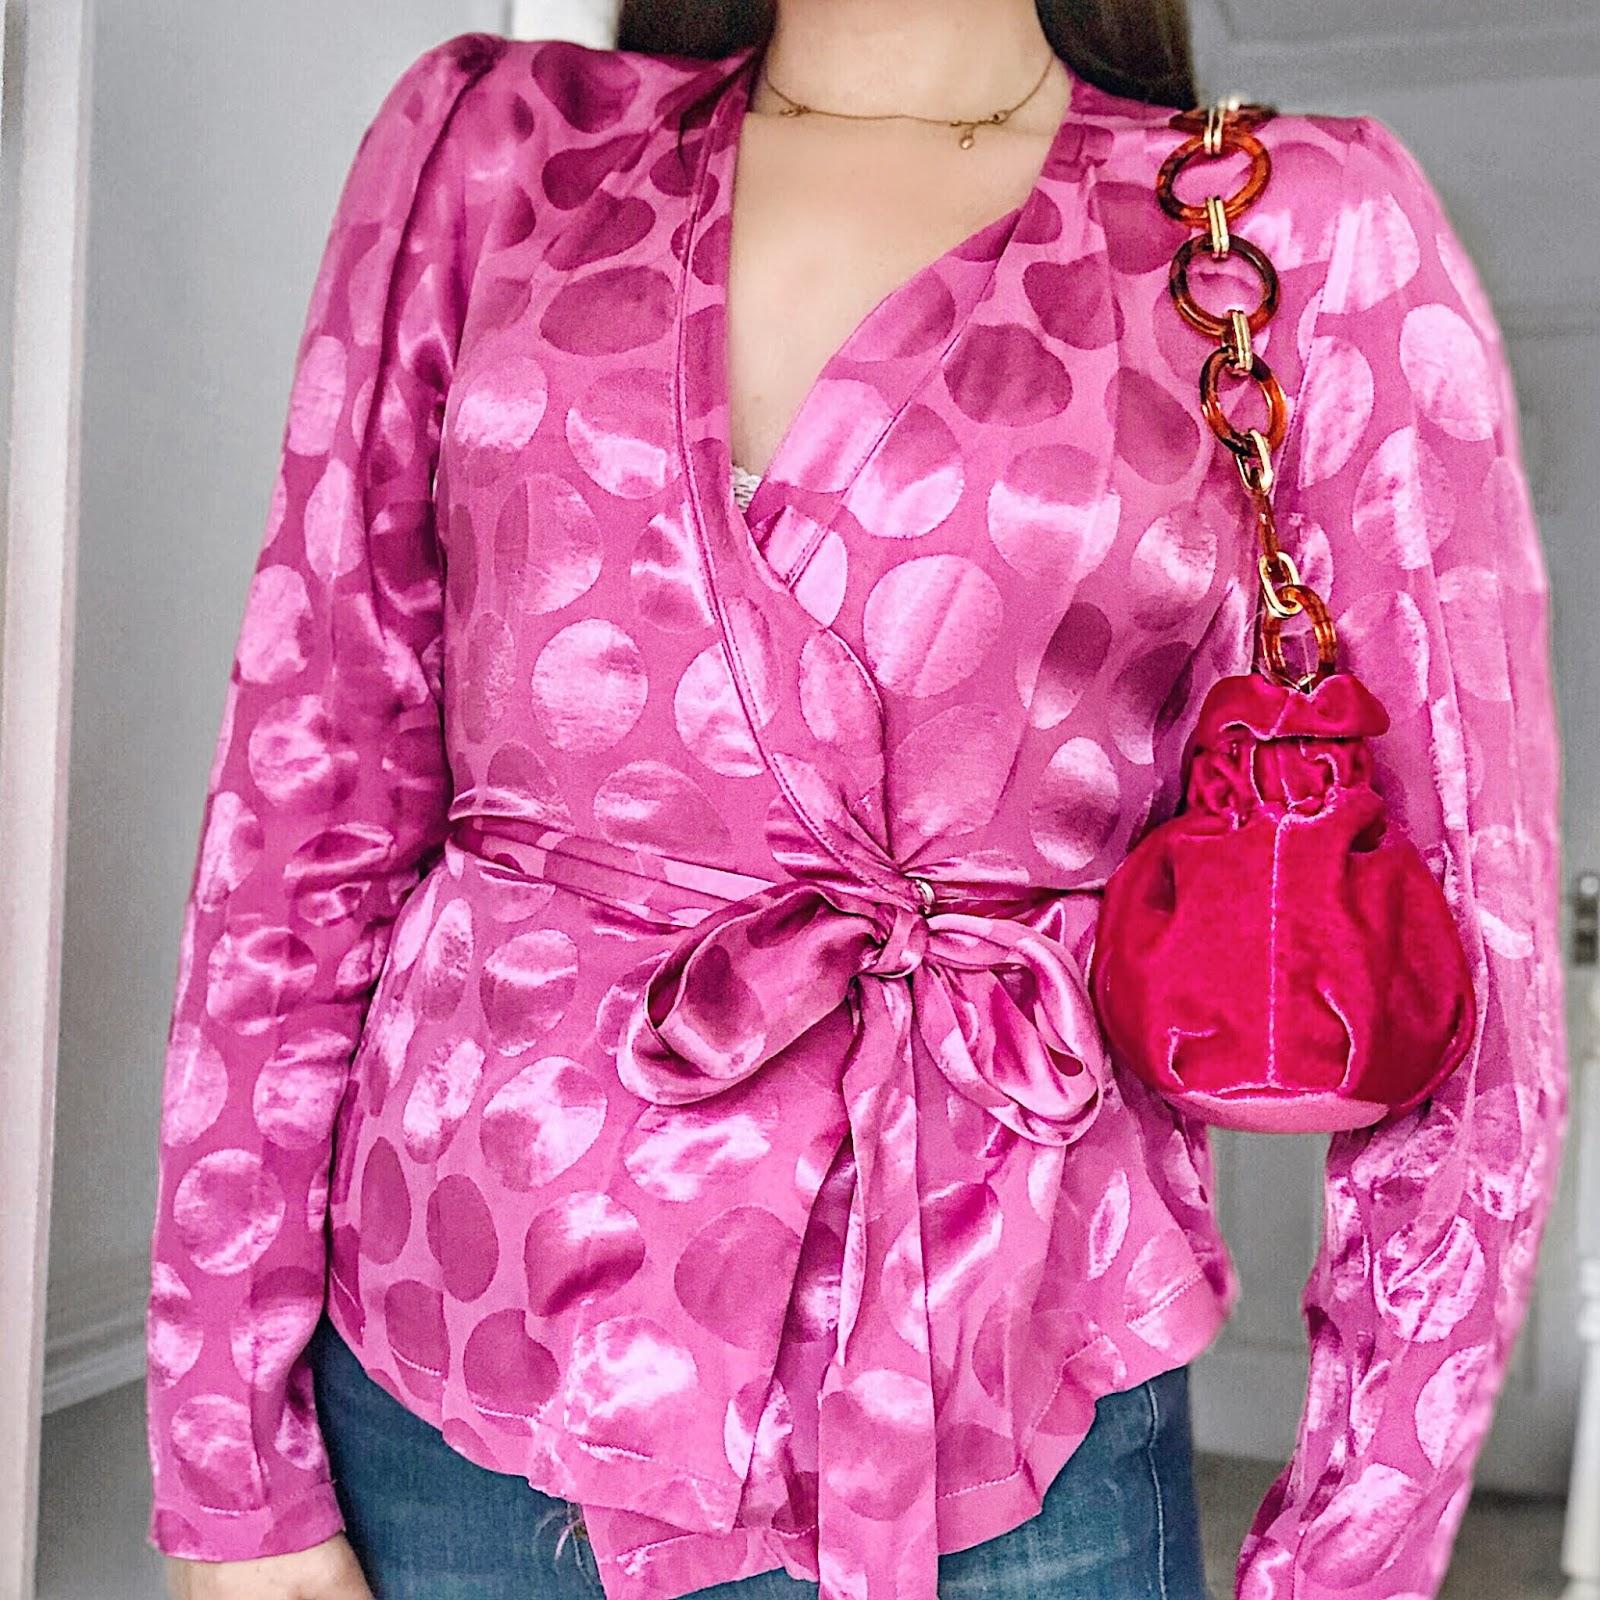 Topshop picks, topshop wishlist, topshop uk, topshop november, uk fashion blogger